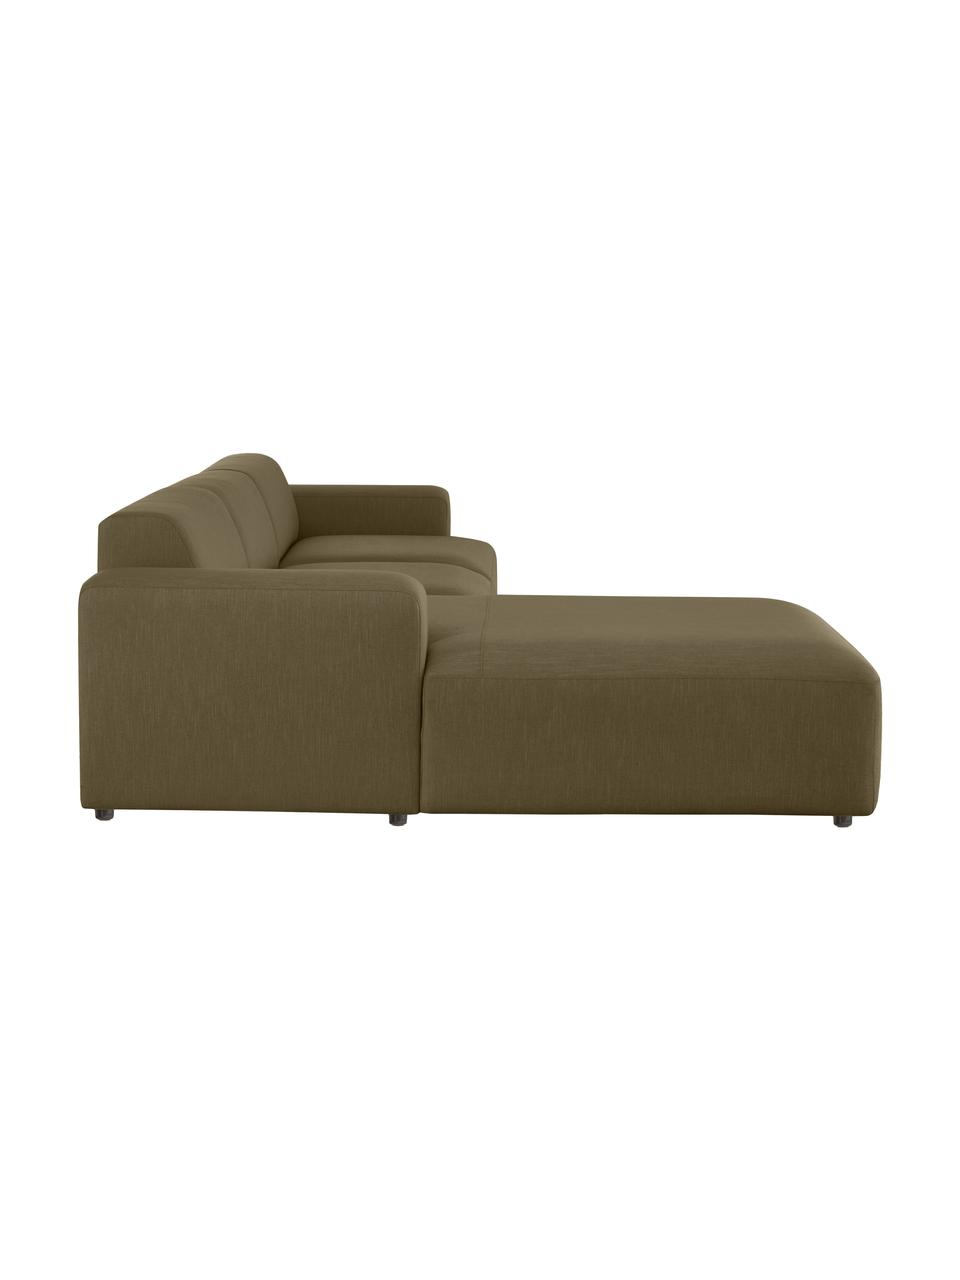 Canapé d'angle 4 places vert olive Melva, Tissu vert olive